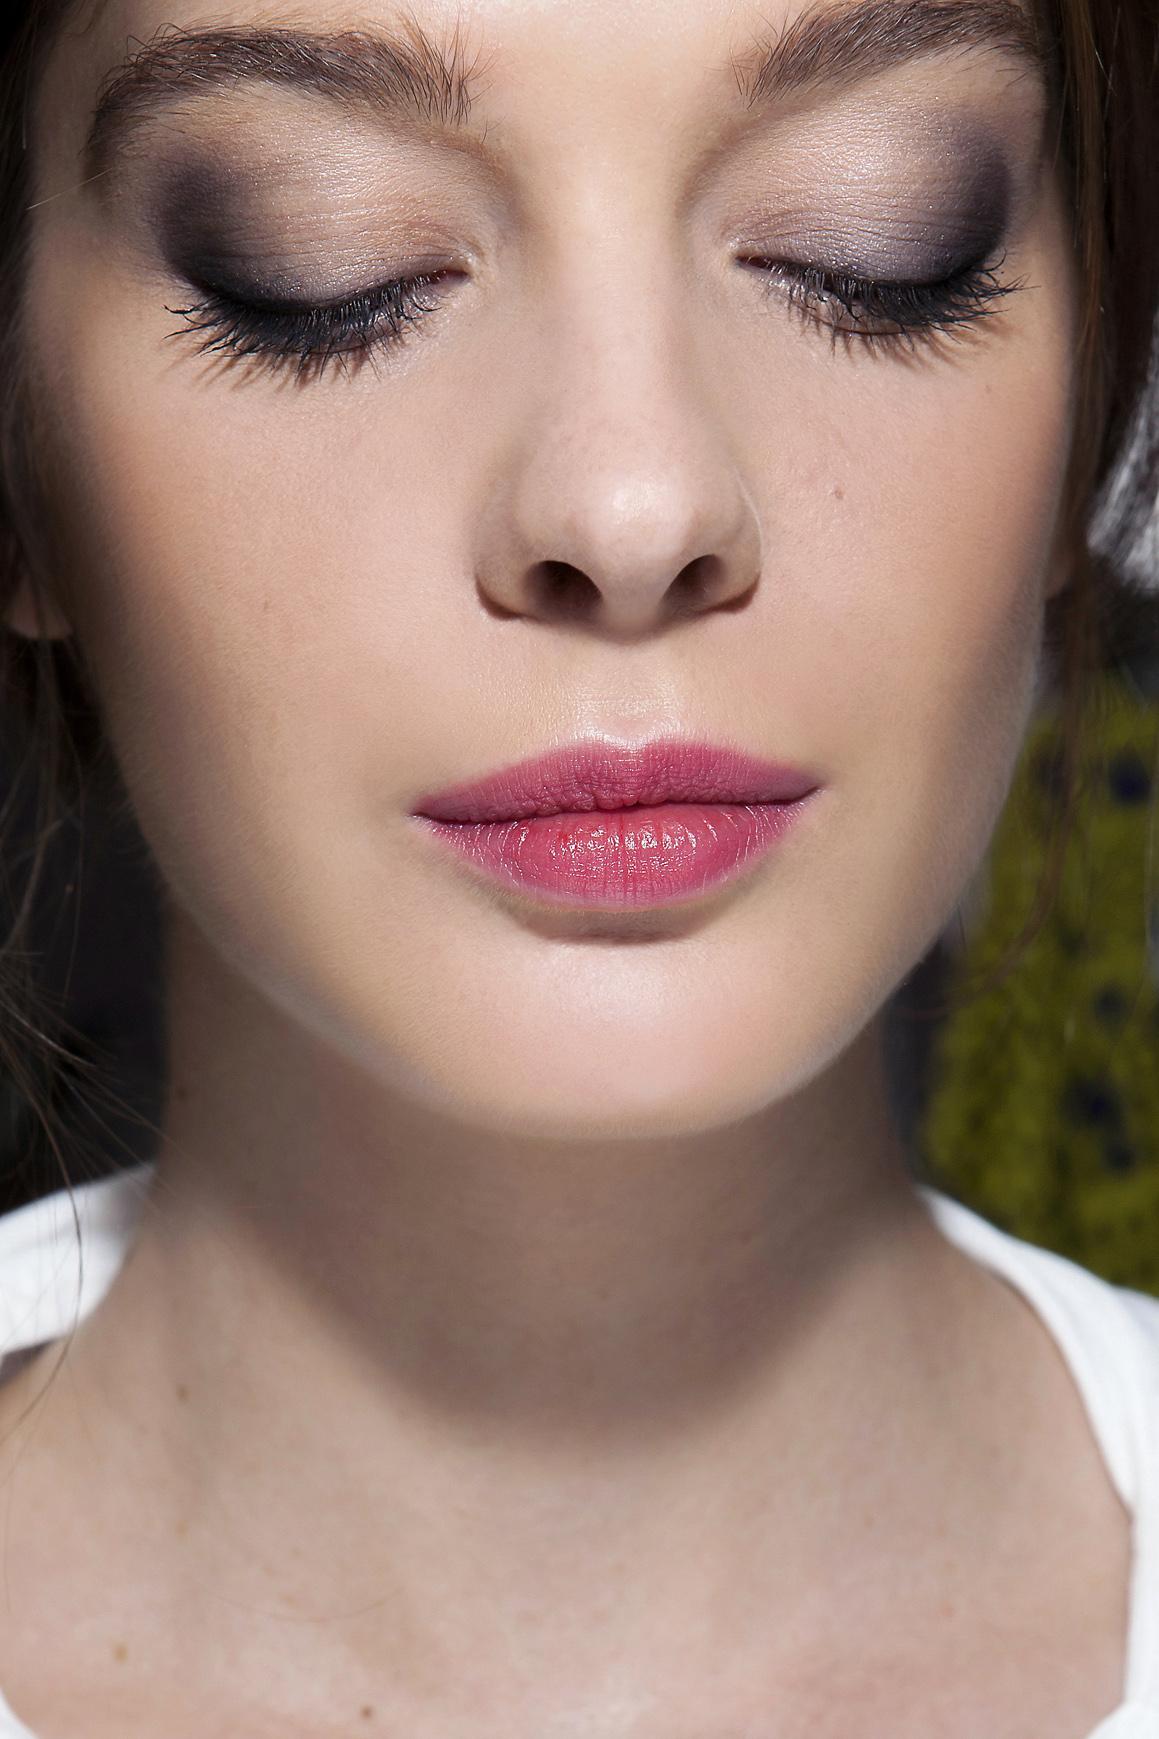 girl wearing pink lipstick and smokey eye makeup